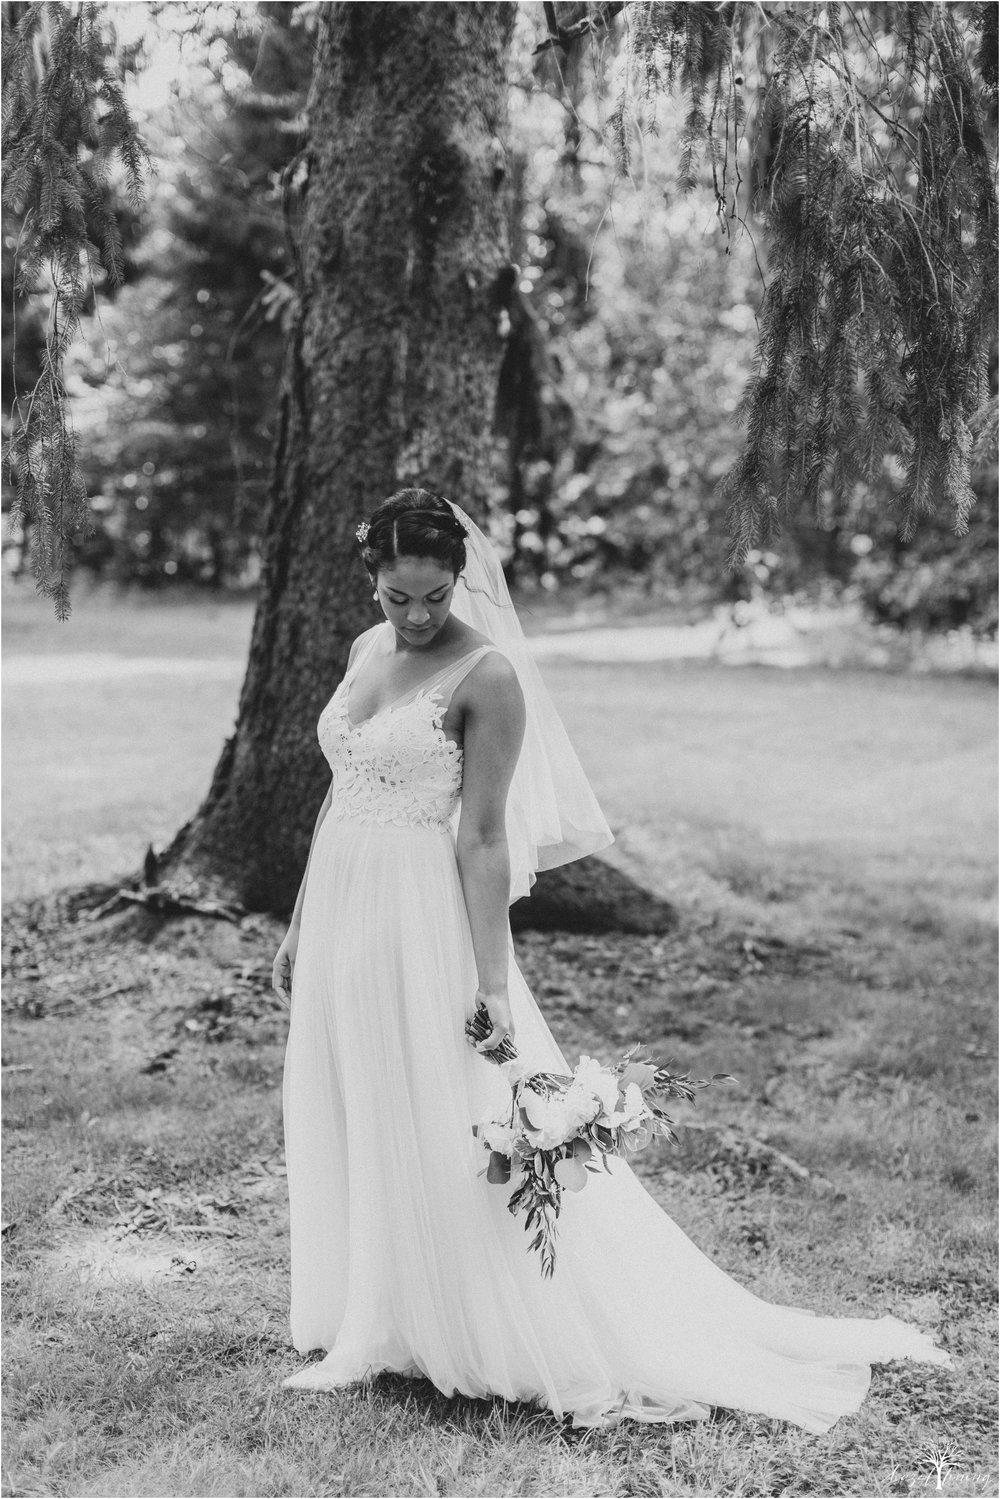 mariah-kreyling-samuel-sherratt-sherrattwiththeworld-peirce-farm-at-witch-hill-boston-massachusetts-wedding-photography-hazel-lining-travel-wedding-elopement-photography_0043.jpg